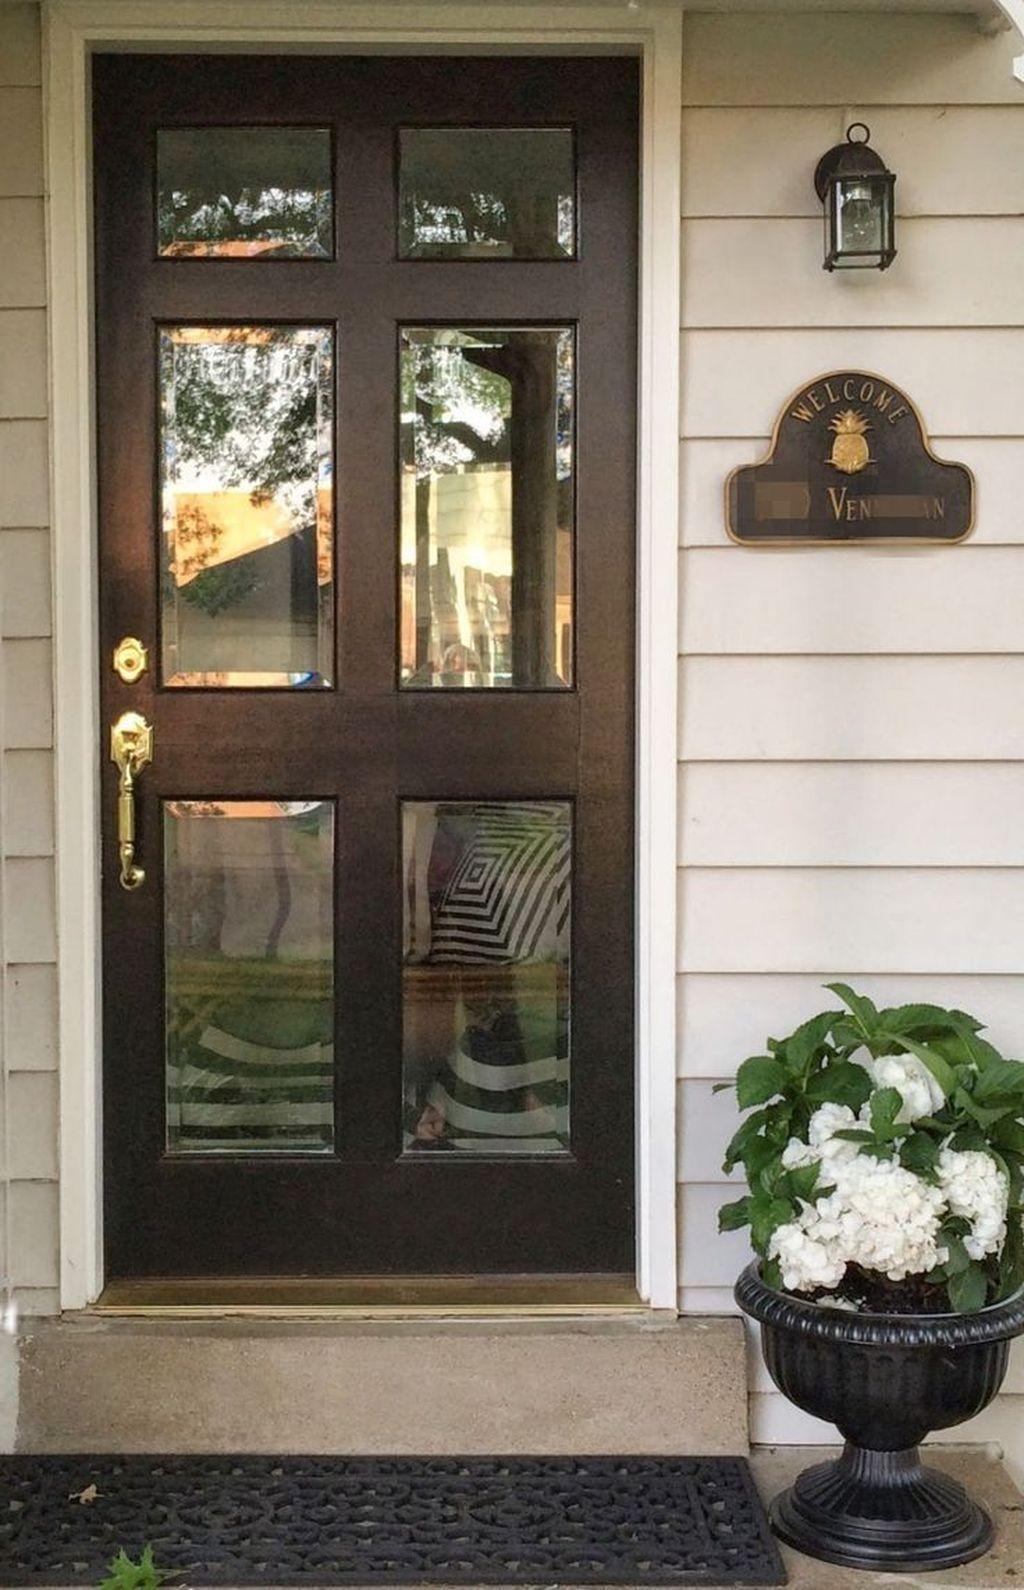 20 Beautiful Farmhouse Front Door Entrance Decor And Design Ideas